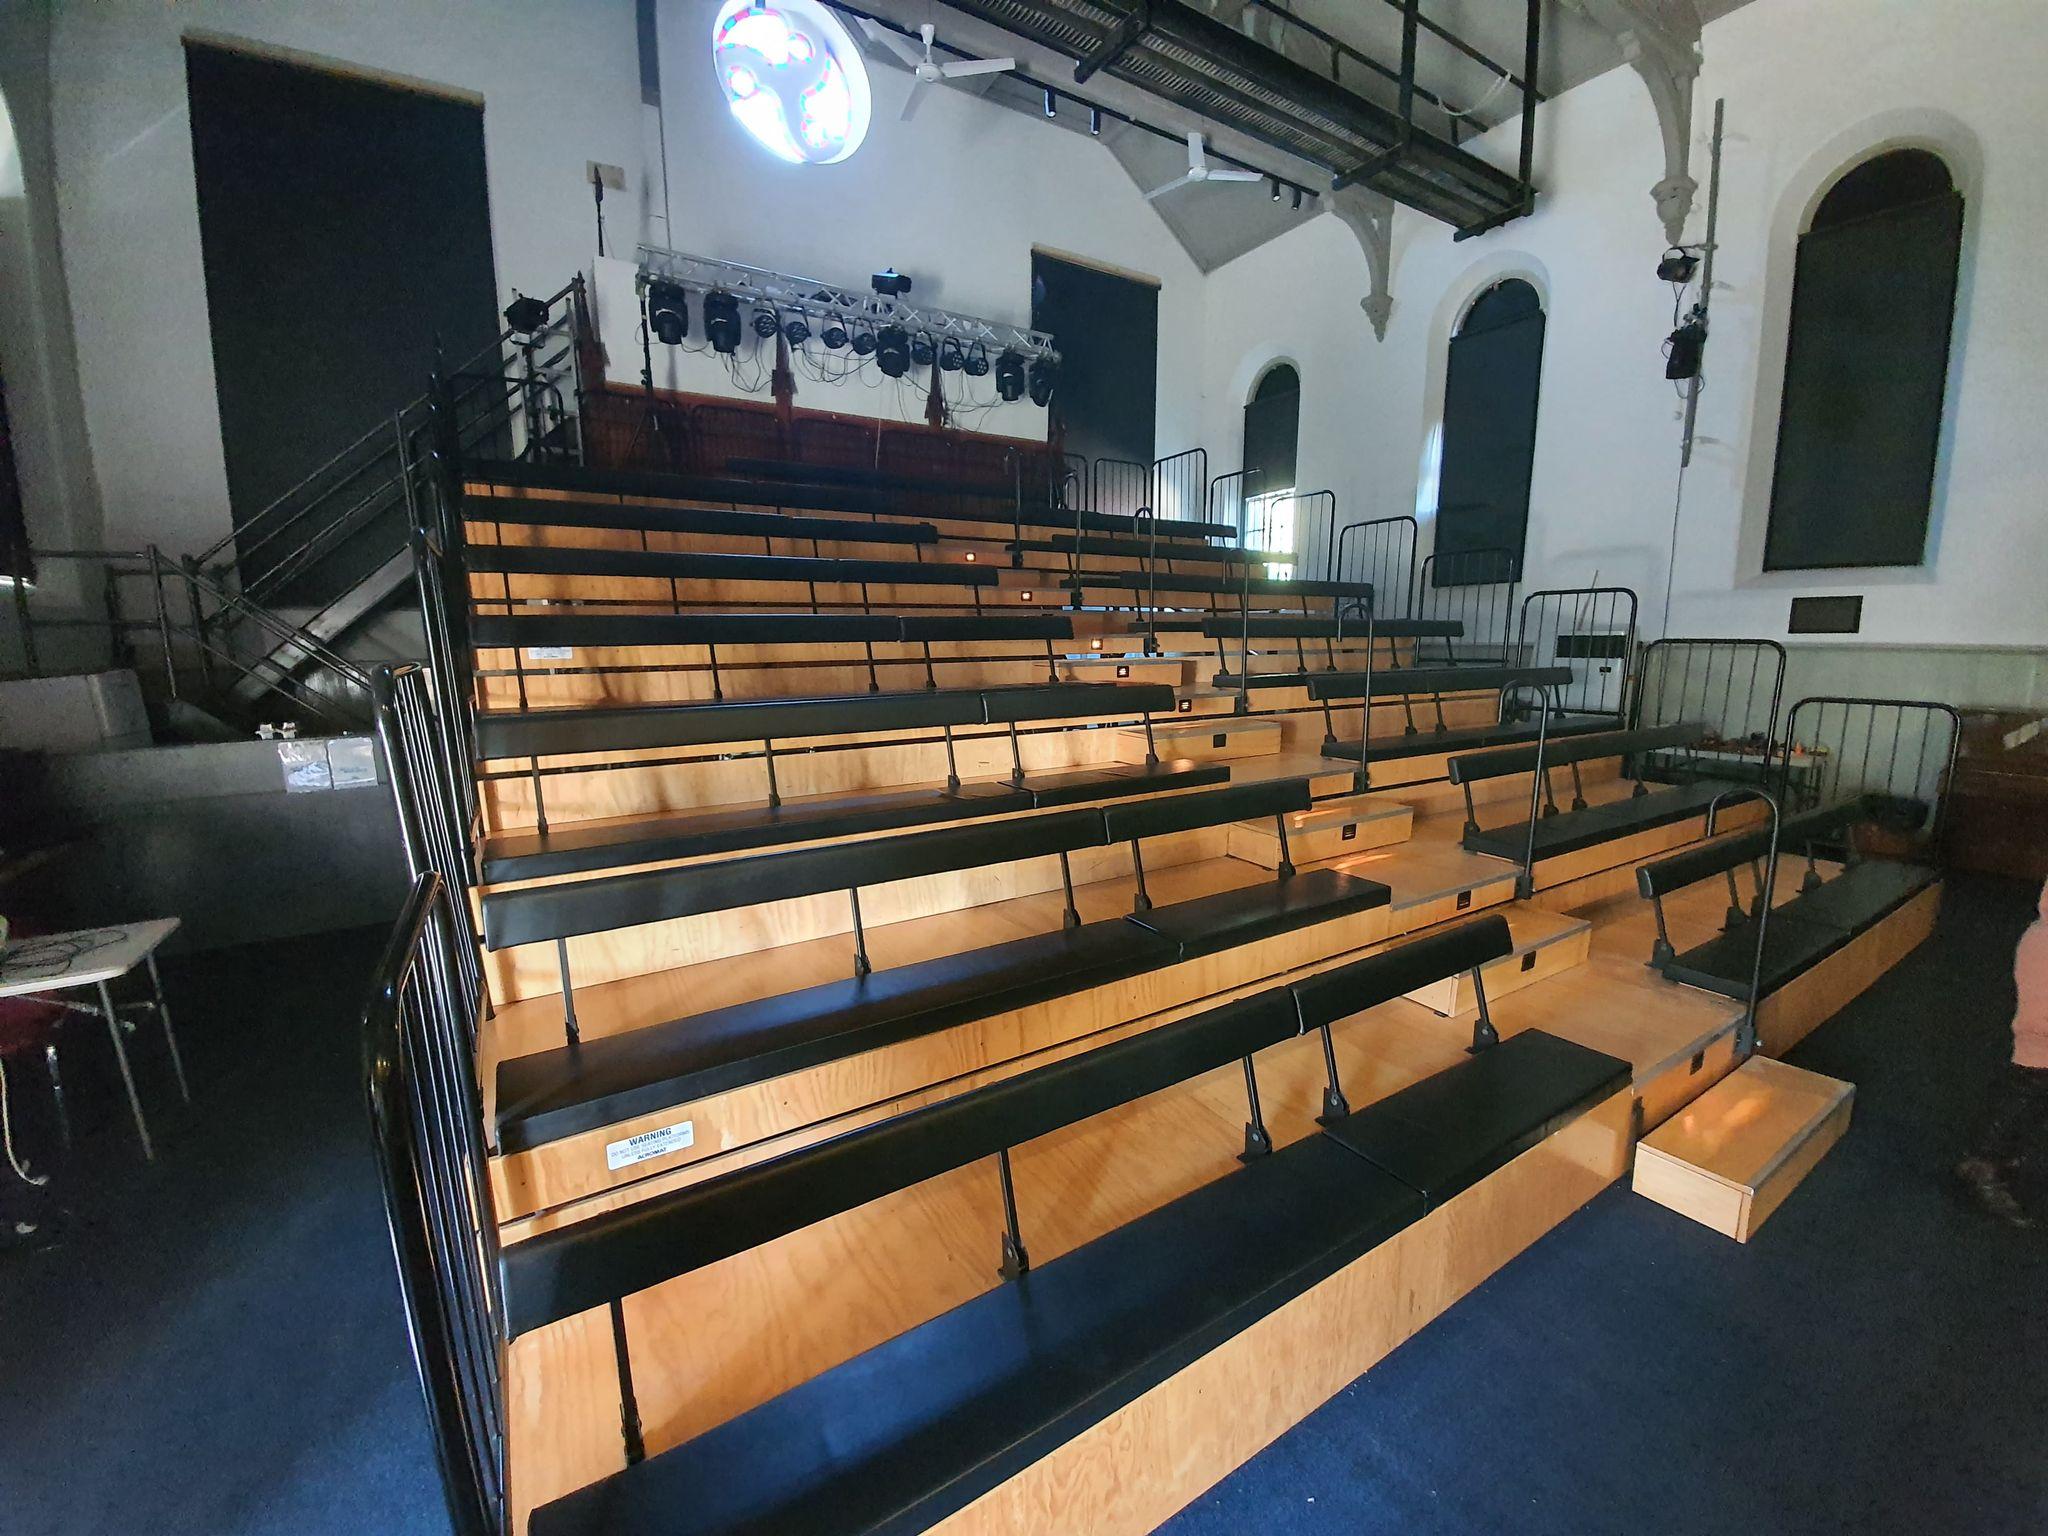 Bluestone Theatre tiered seating